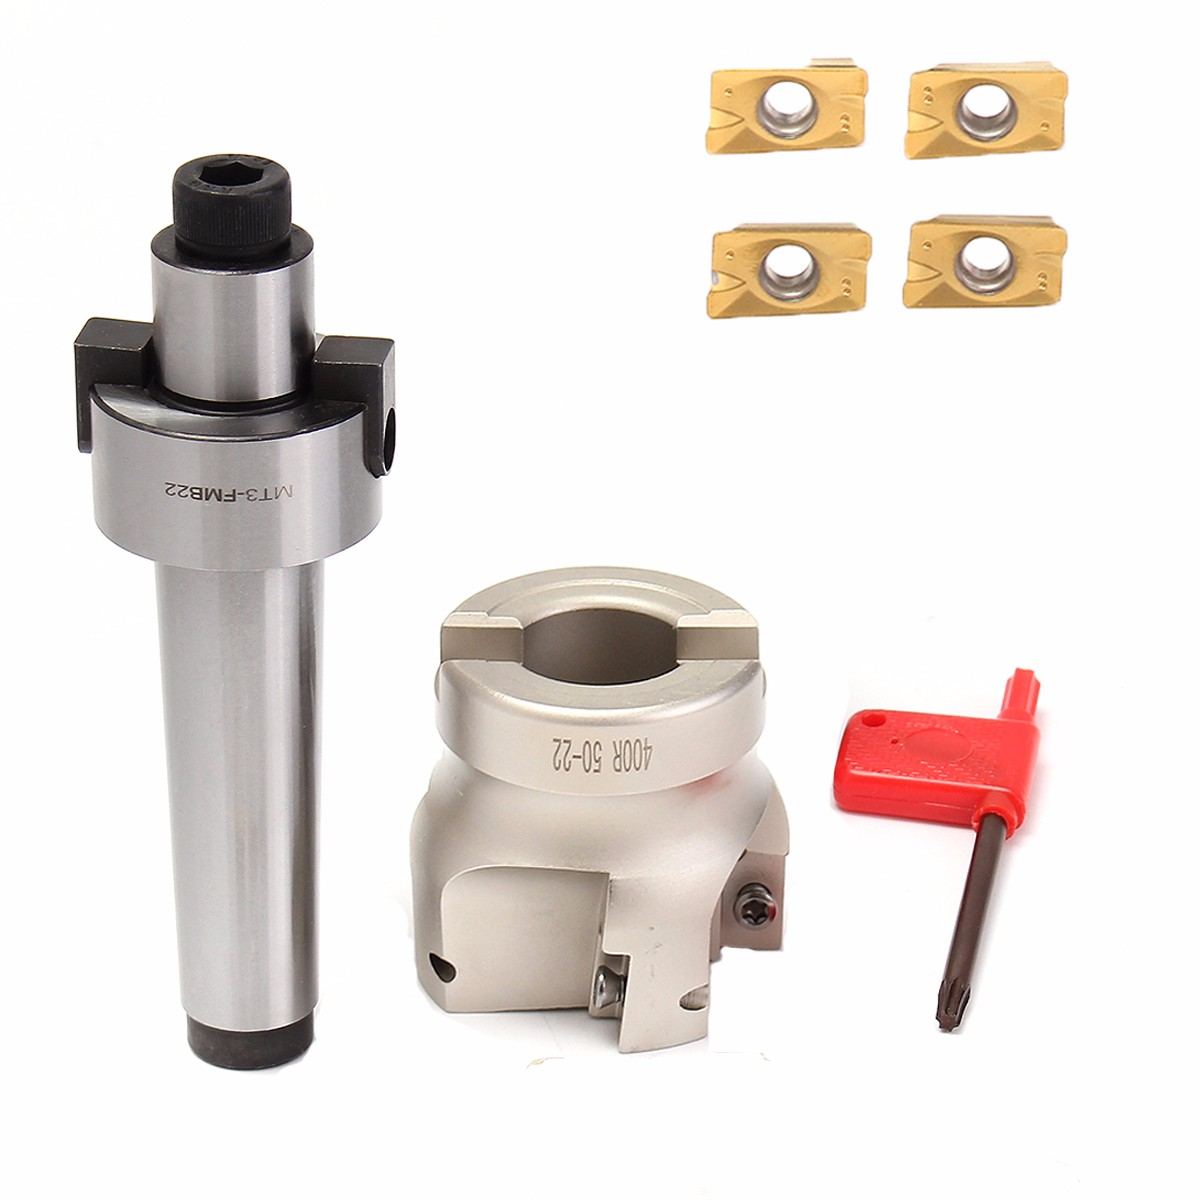 Tool Holder Shank MT3 FMB22 M12 50mm + Endmill CNC Drawbar Face Milling Cutter + 4pcs APMT1604 Carbide Inserts Set